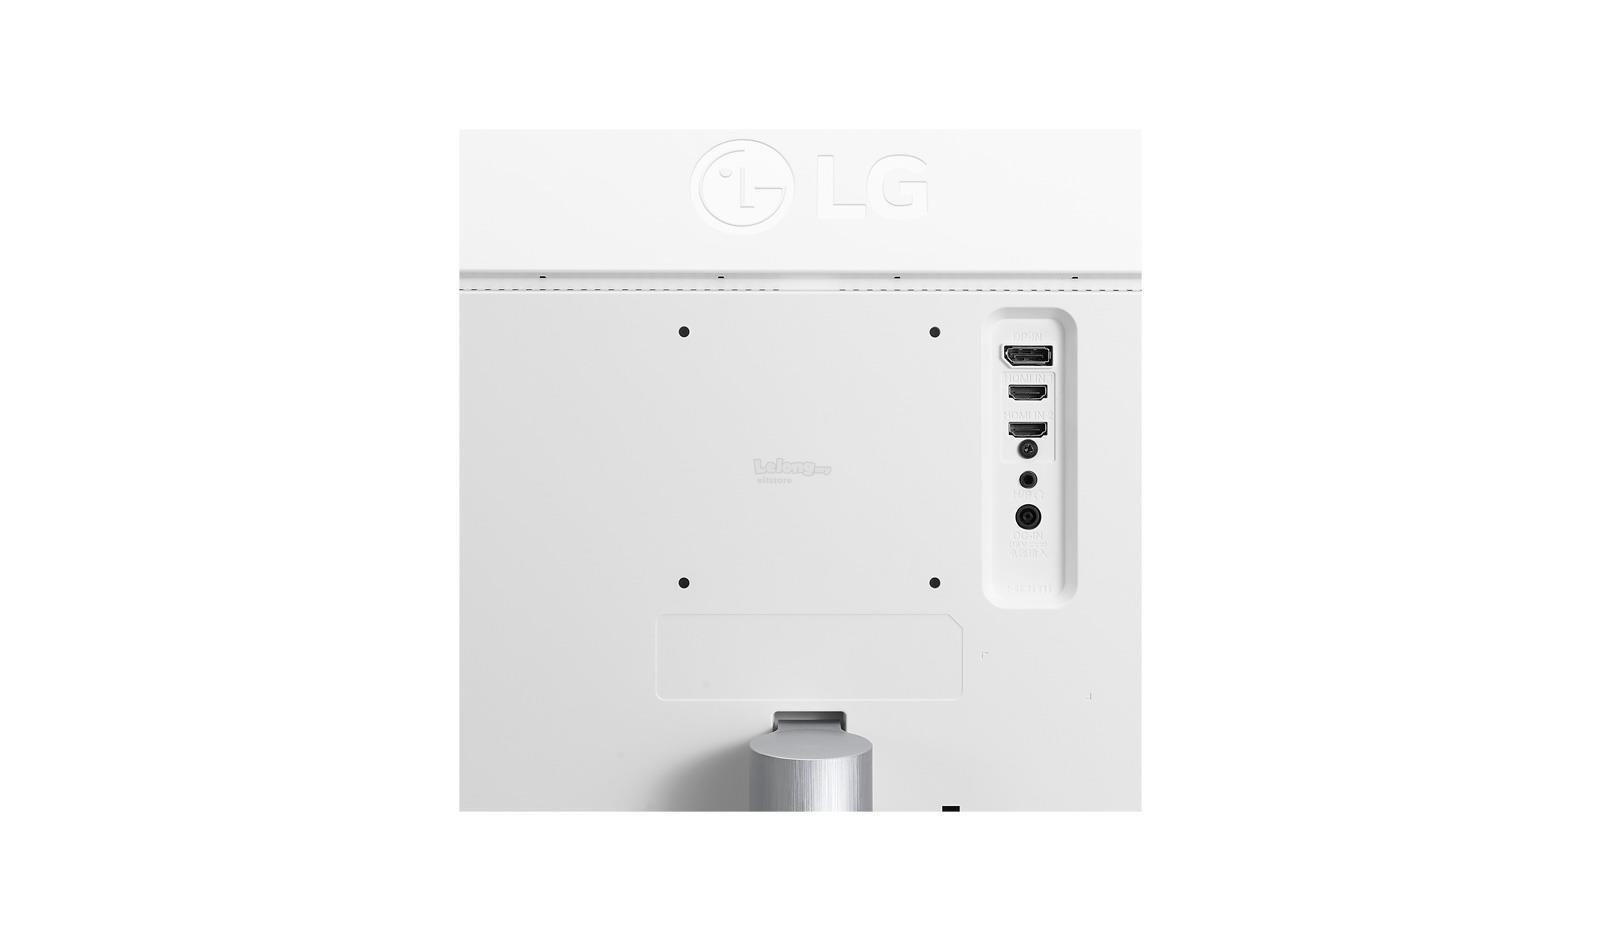 LG 29WK600-W 29' 21:9 UltraWide™ FULL HD IPS MONITOR